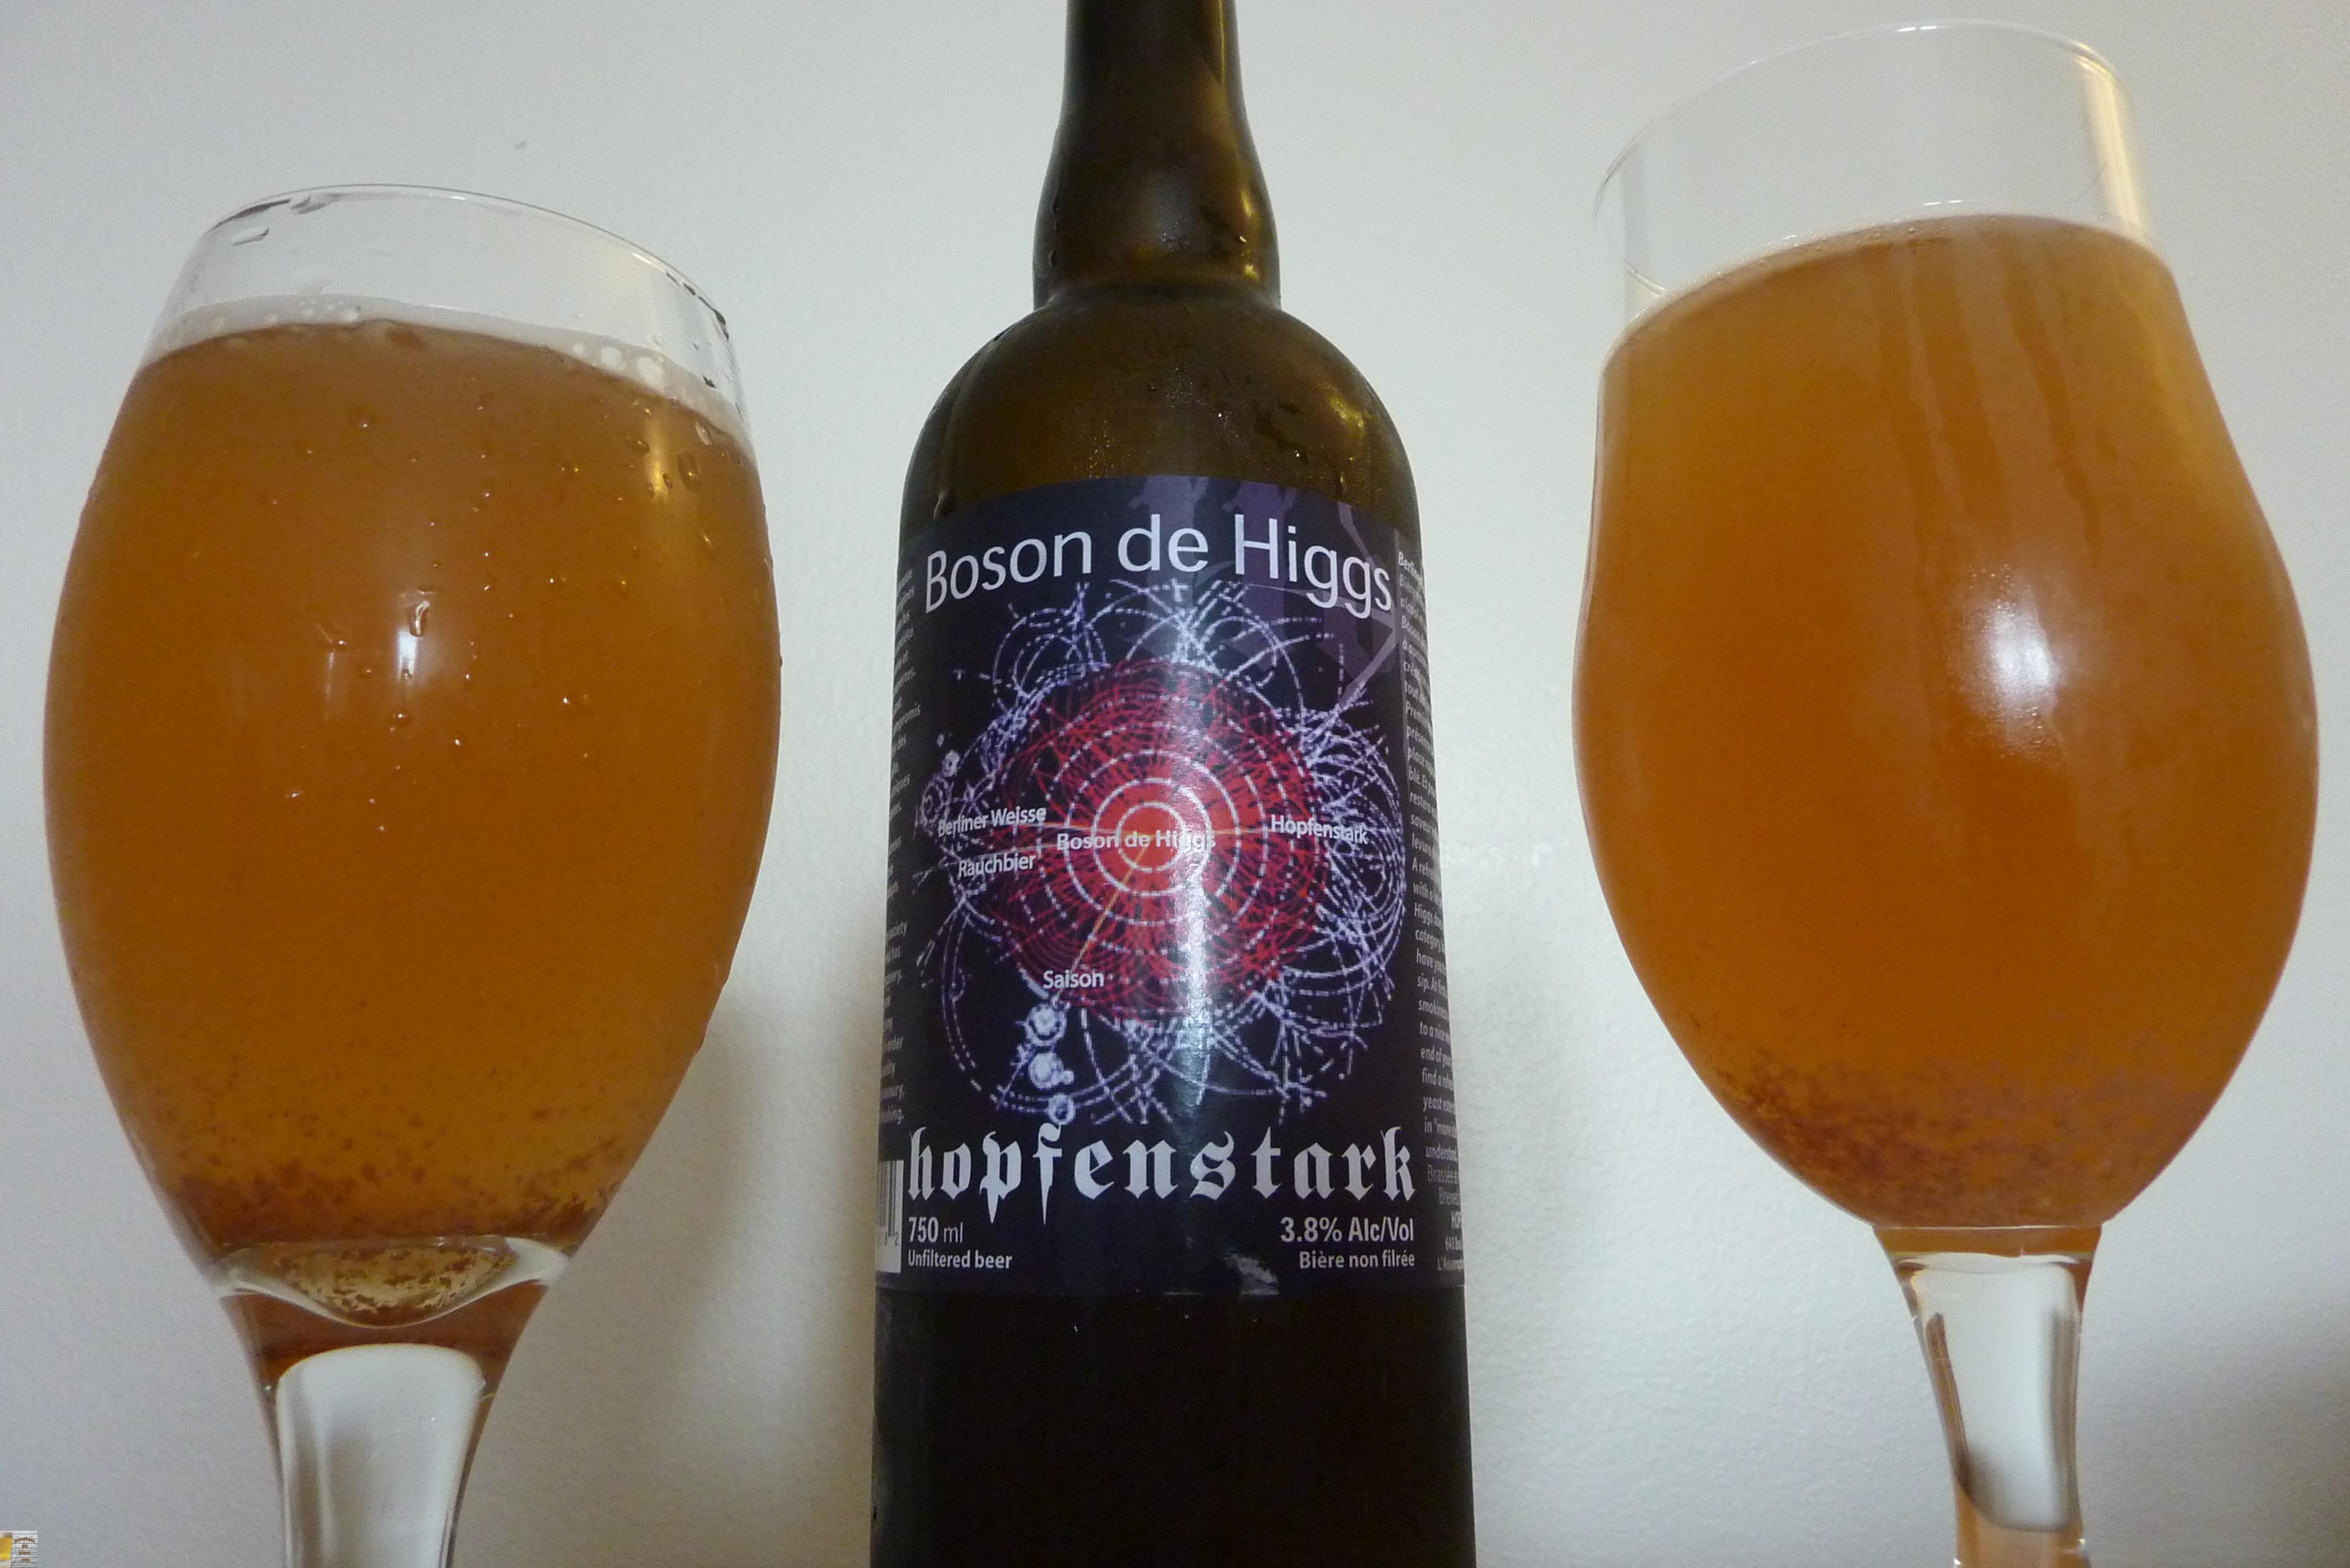 Boson de Higgs d'Hopfenstark